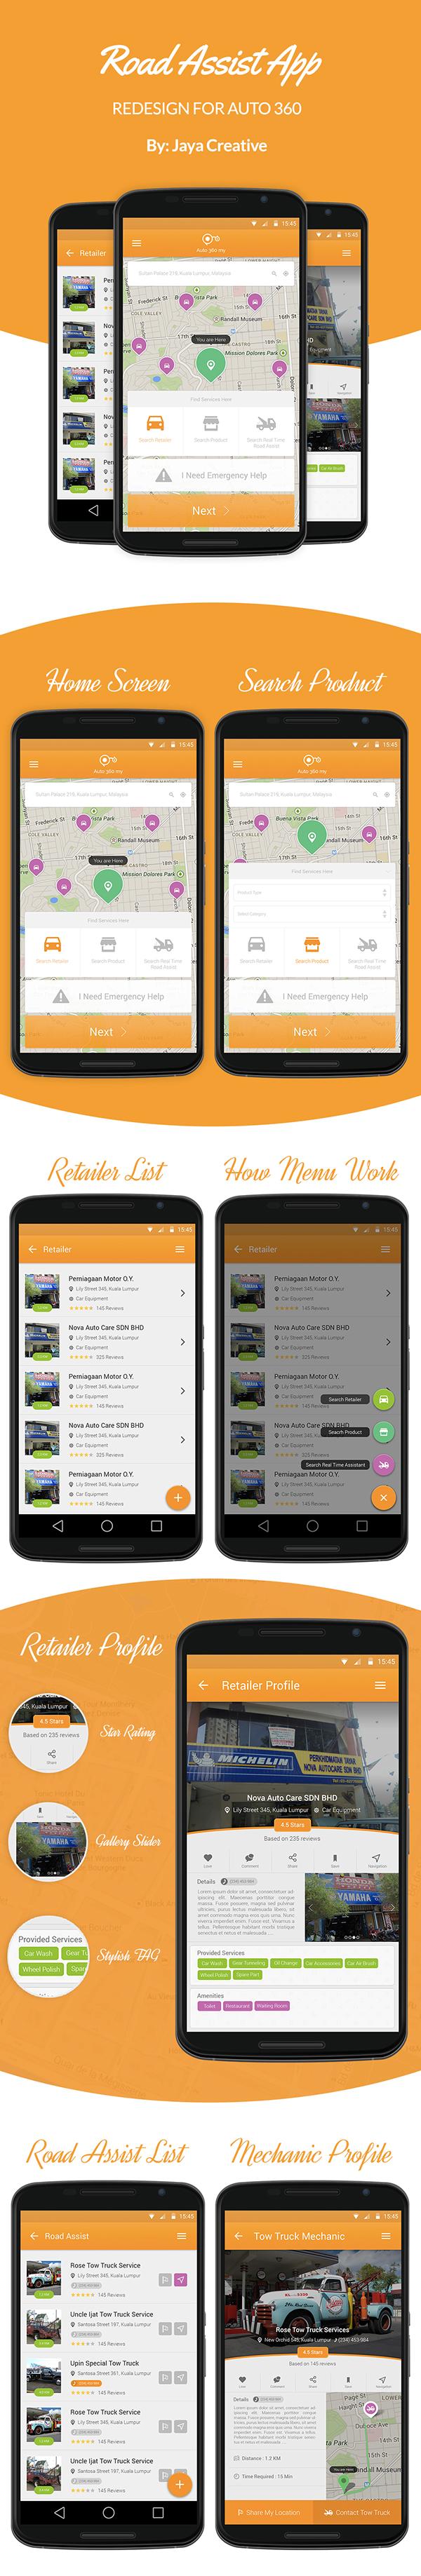 Navigation App Android App Road Assist App Assistance App map navigation